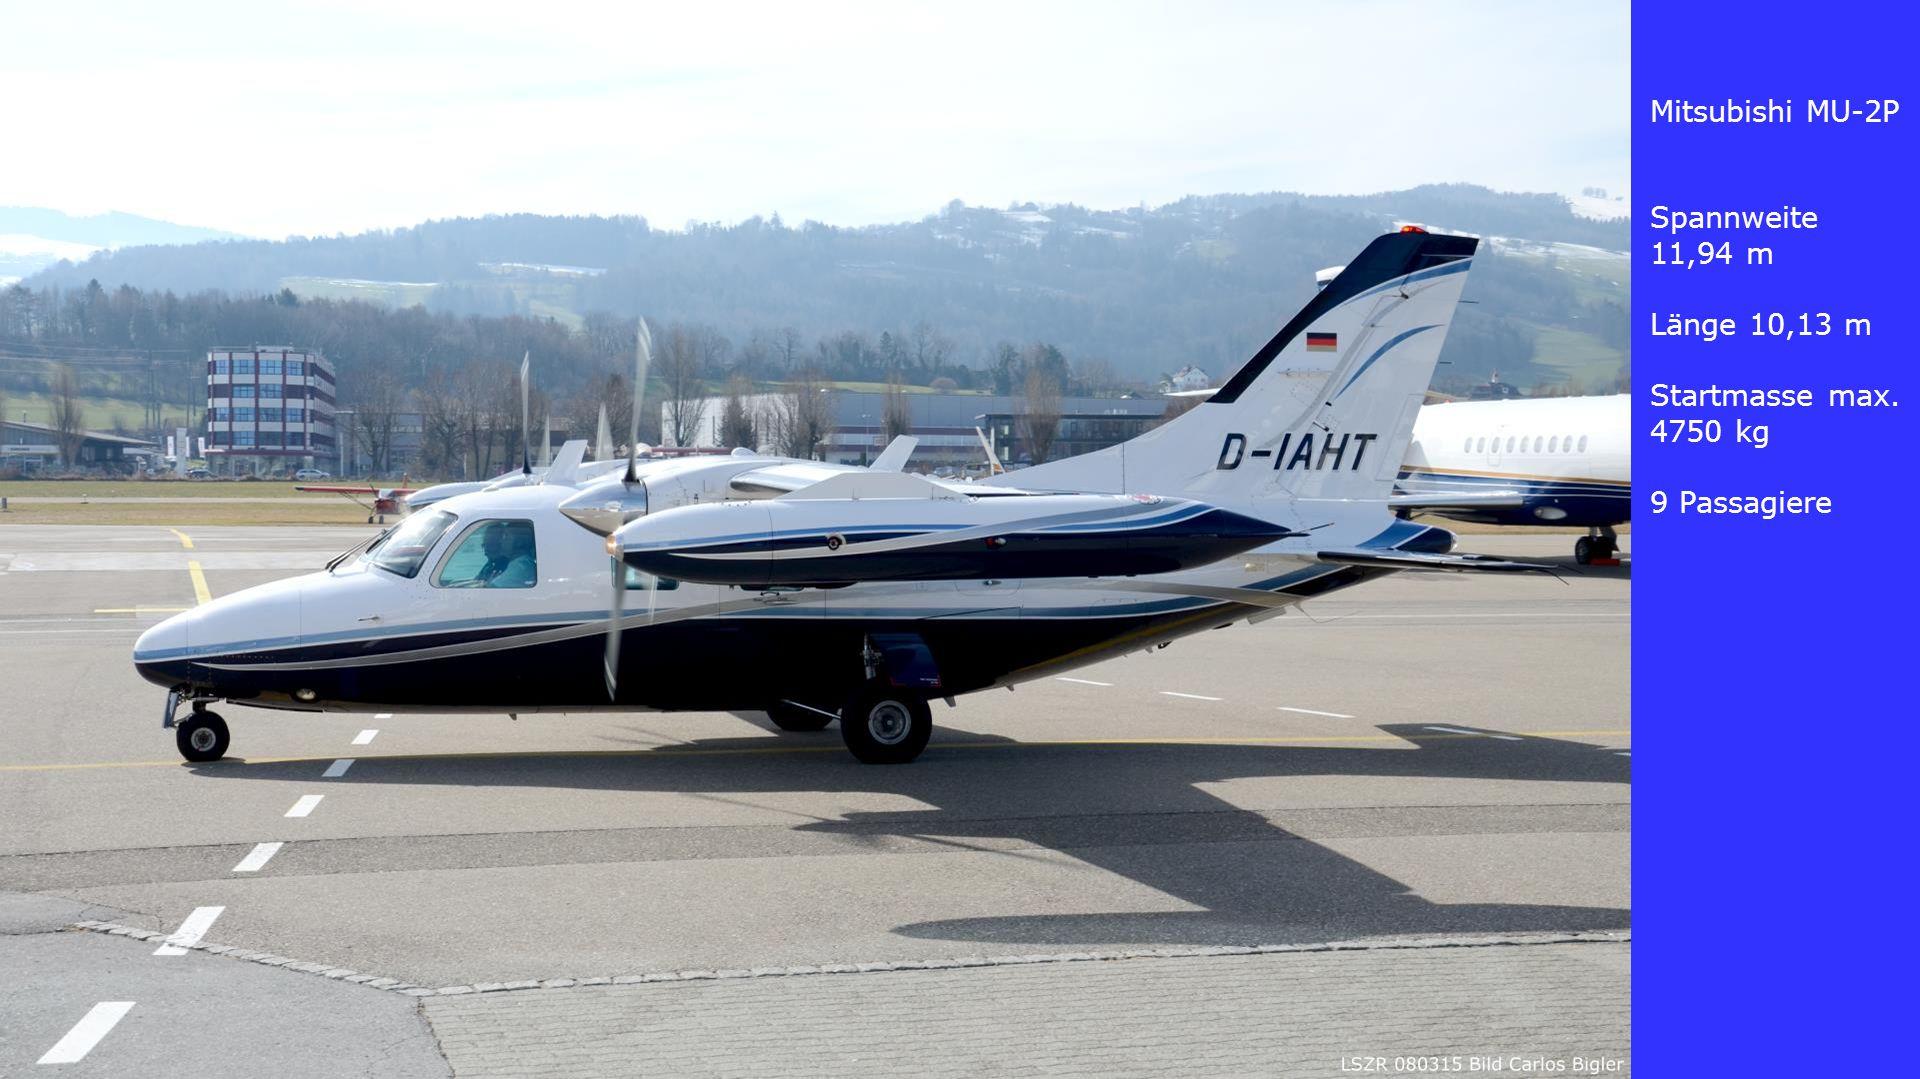 Mitsubishi MU-2P Spannweite 11,94 m Länge 10,13 m Startmasse max. 4750 kg 9 Passagiere